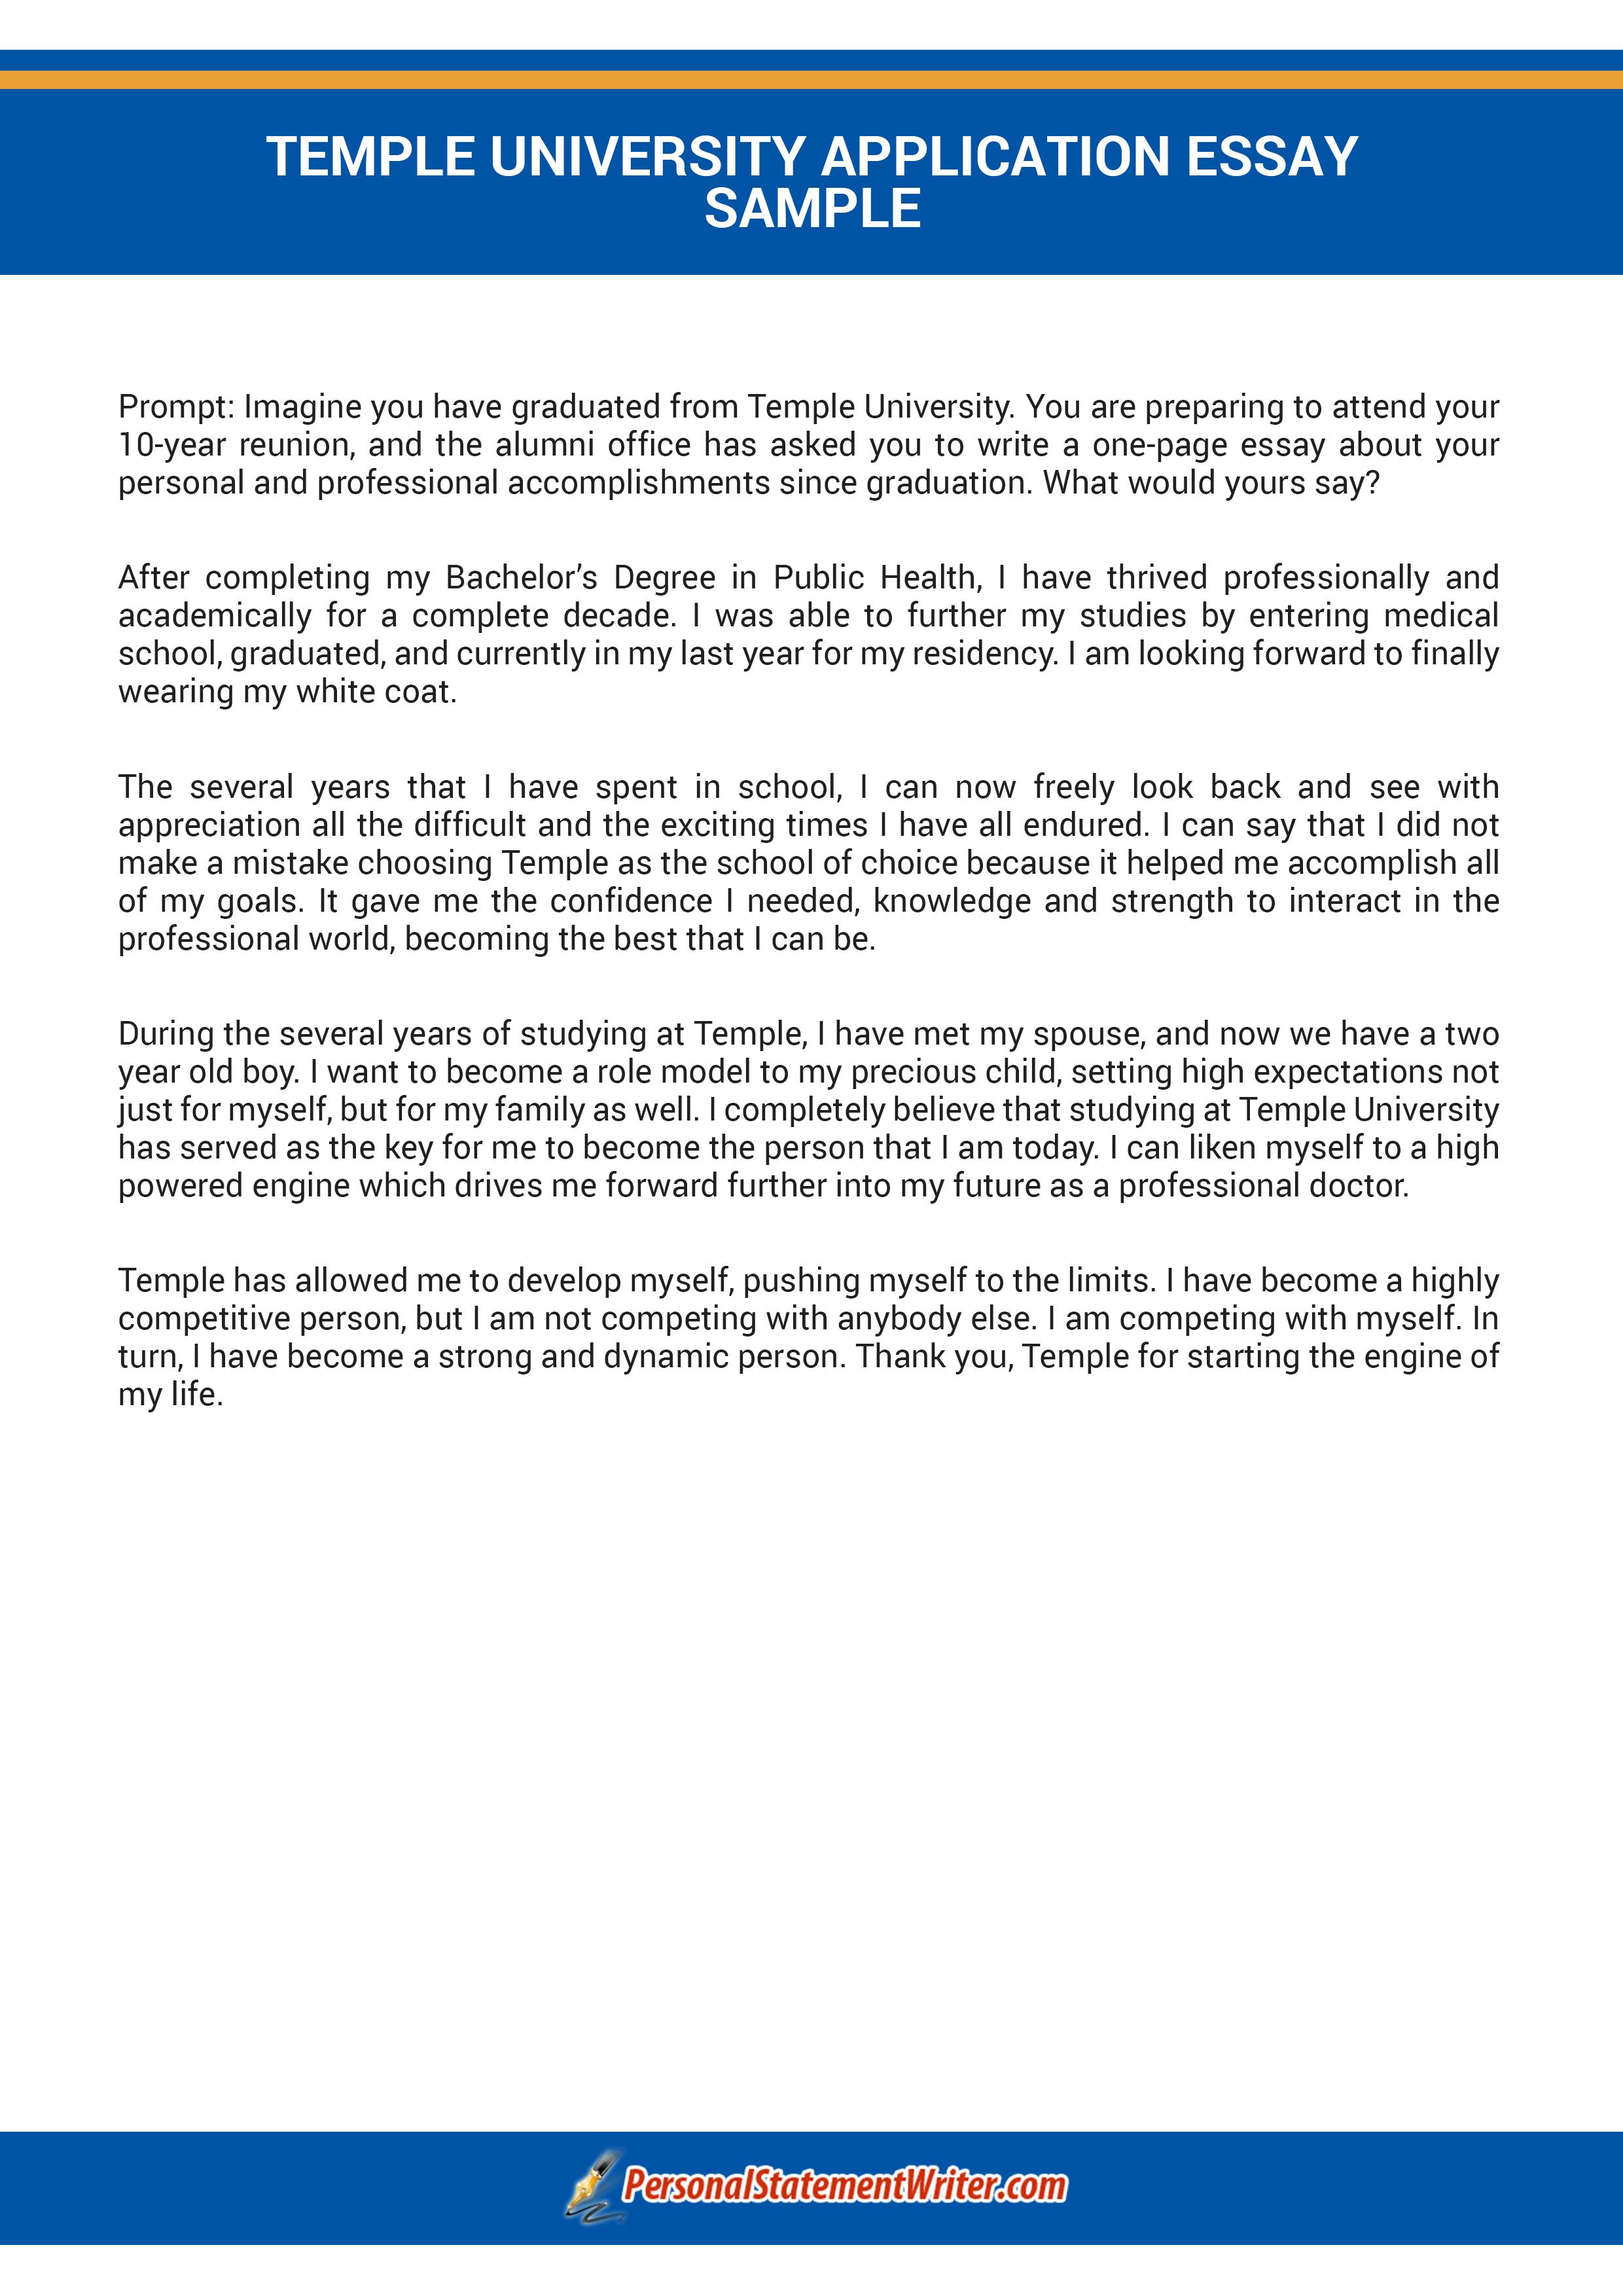 Temple university essay help